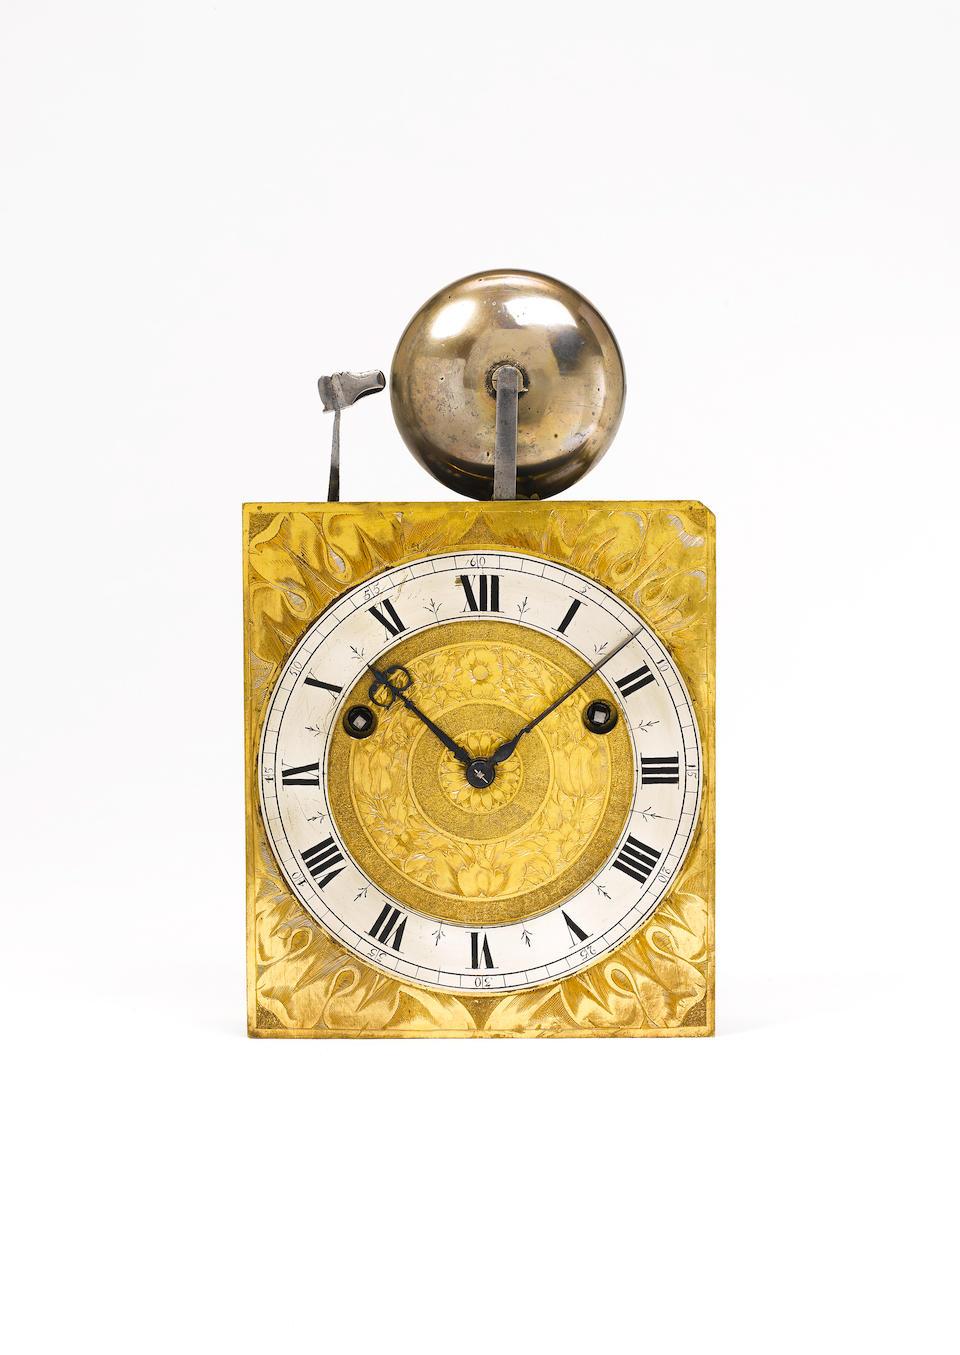 A fine and rare mid 17th century ebony veneered architectural turntable bracket clock James Cowpe at Ffox Hall (sic)